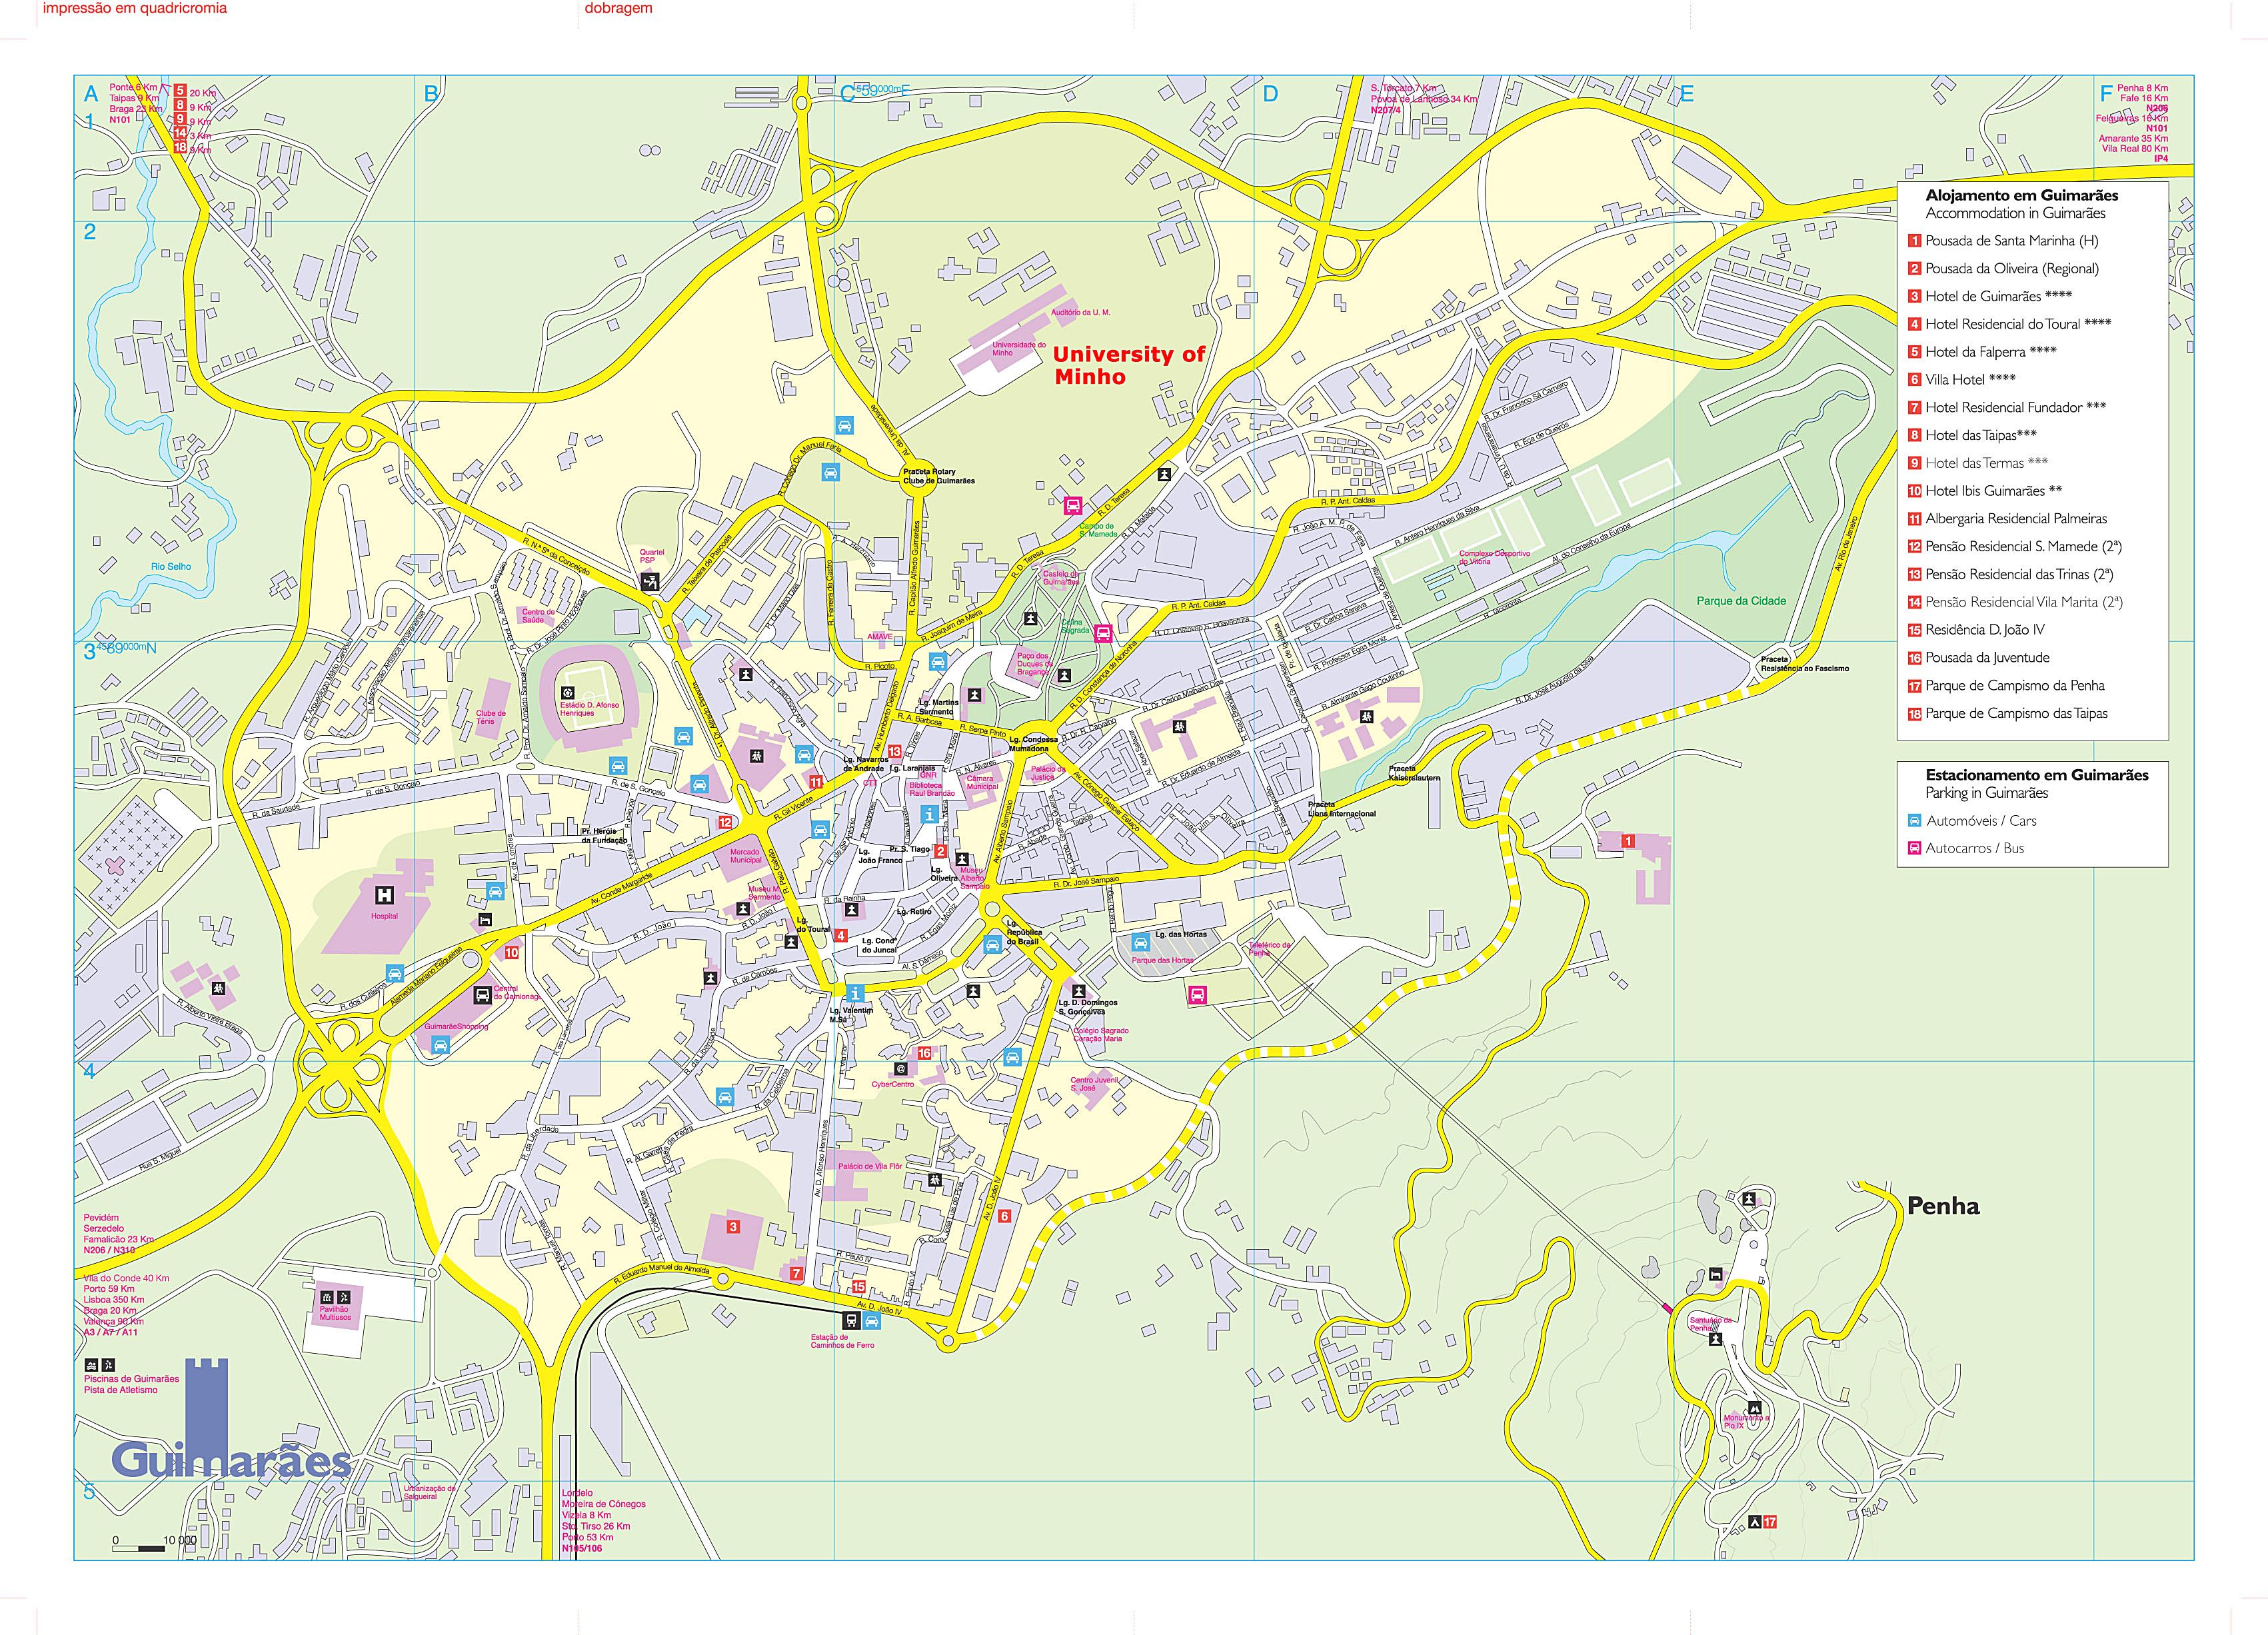 guimarães mapa Large Guimaraes Maps for Free Download and Print | High Resolution  guimarães mapa